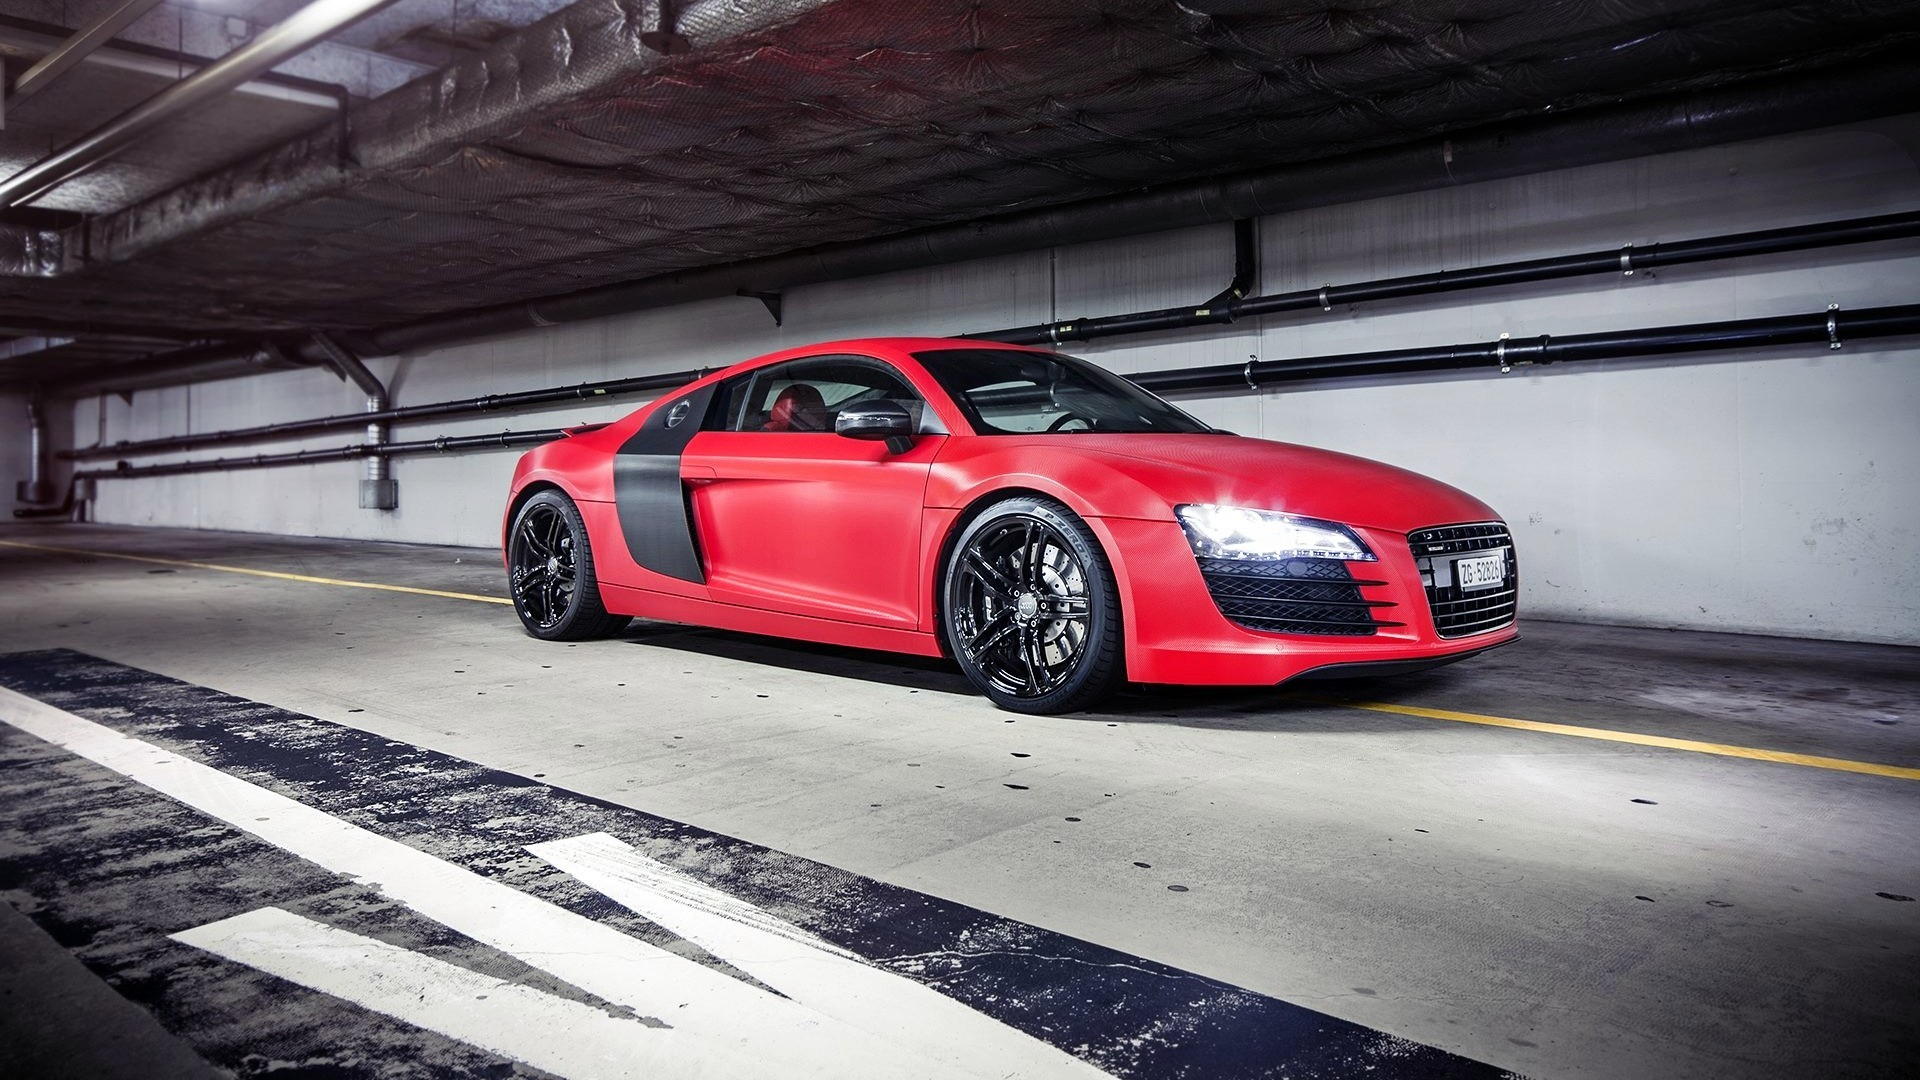 AUDI V8 red